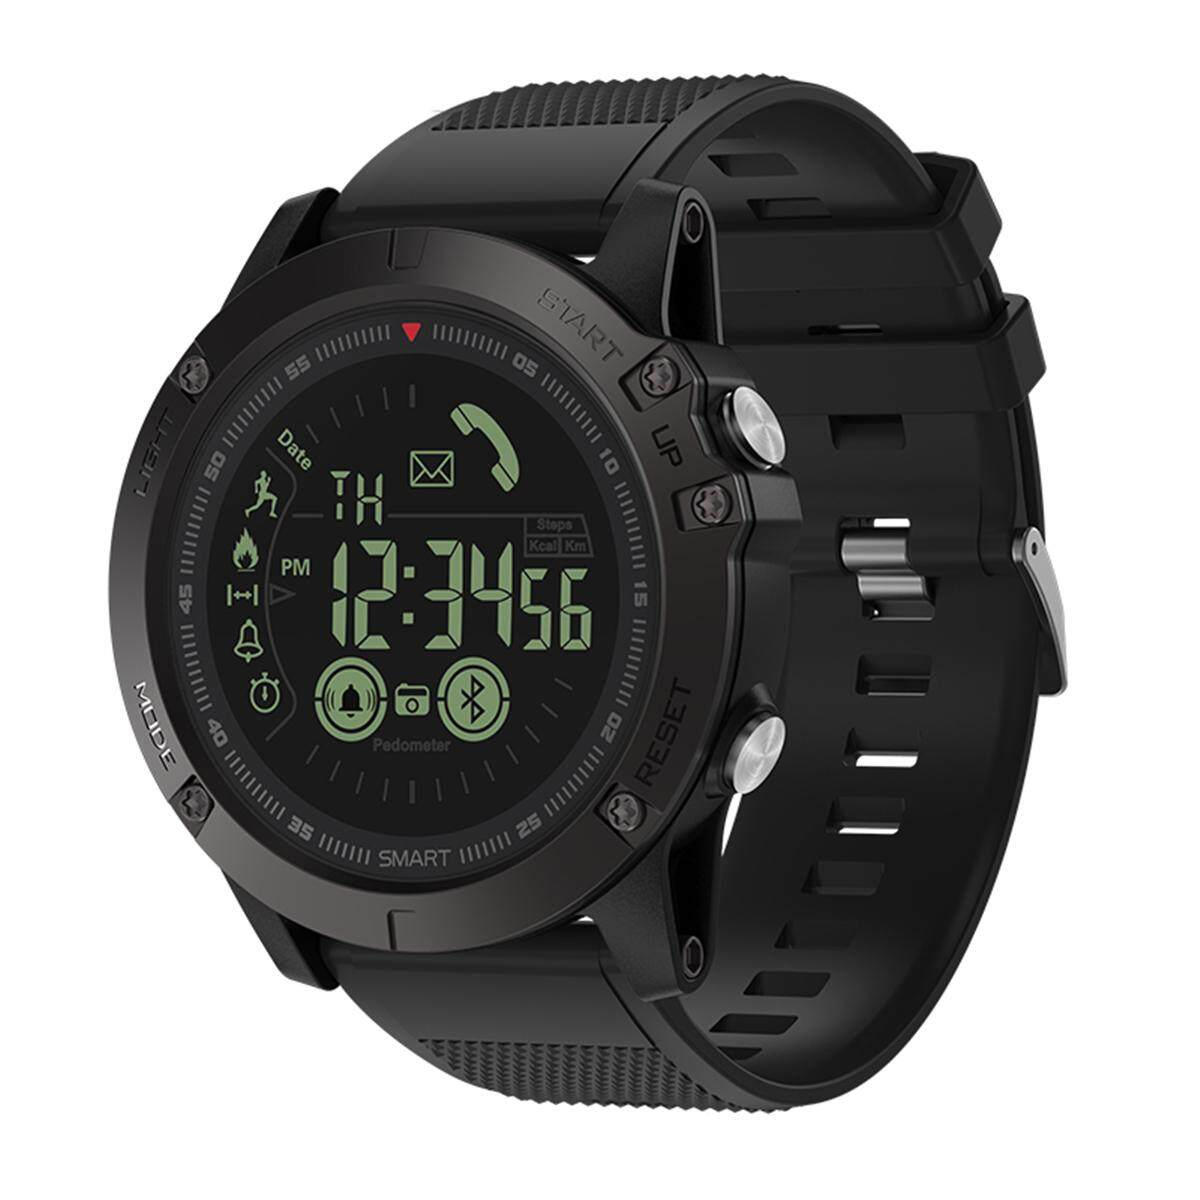 Review Zeblaze Vibe 3 Wrist Smart Watch Phone Alarm Mate Waterproof Camera Ios Android Black Intl Zeblaze